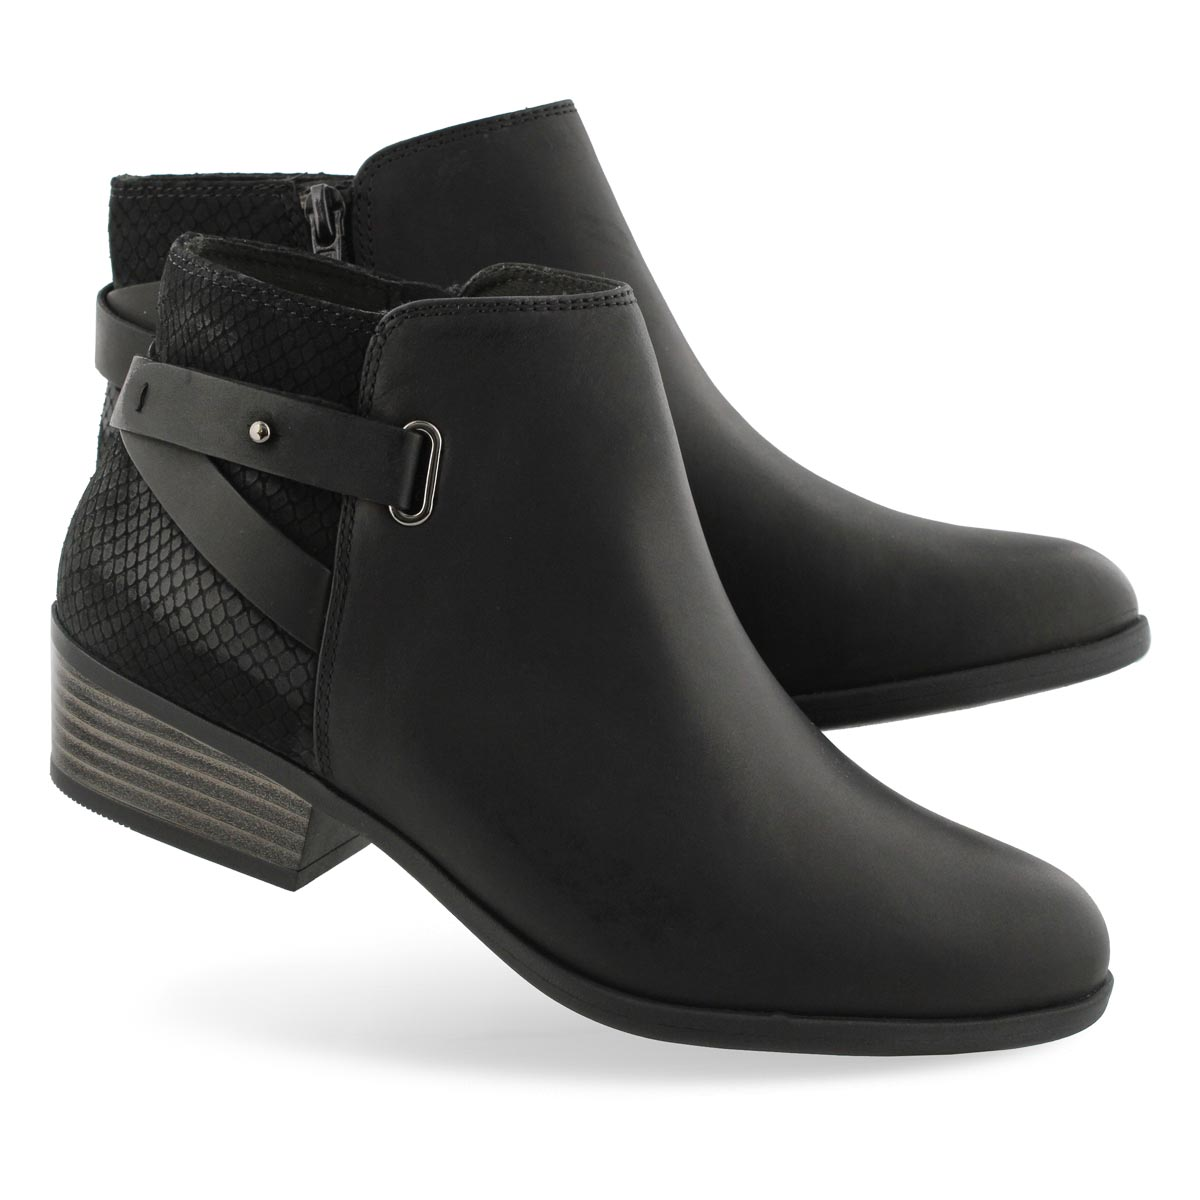 Lds Addiy Gladys black casual bootie